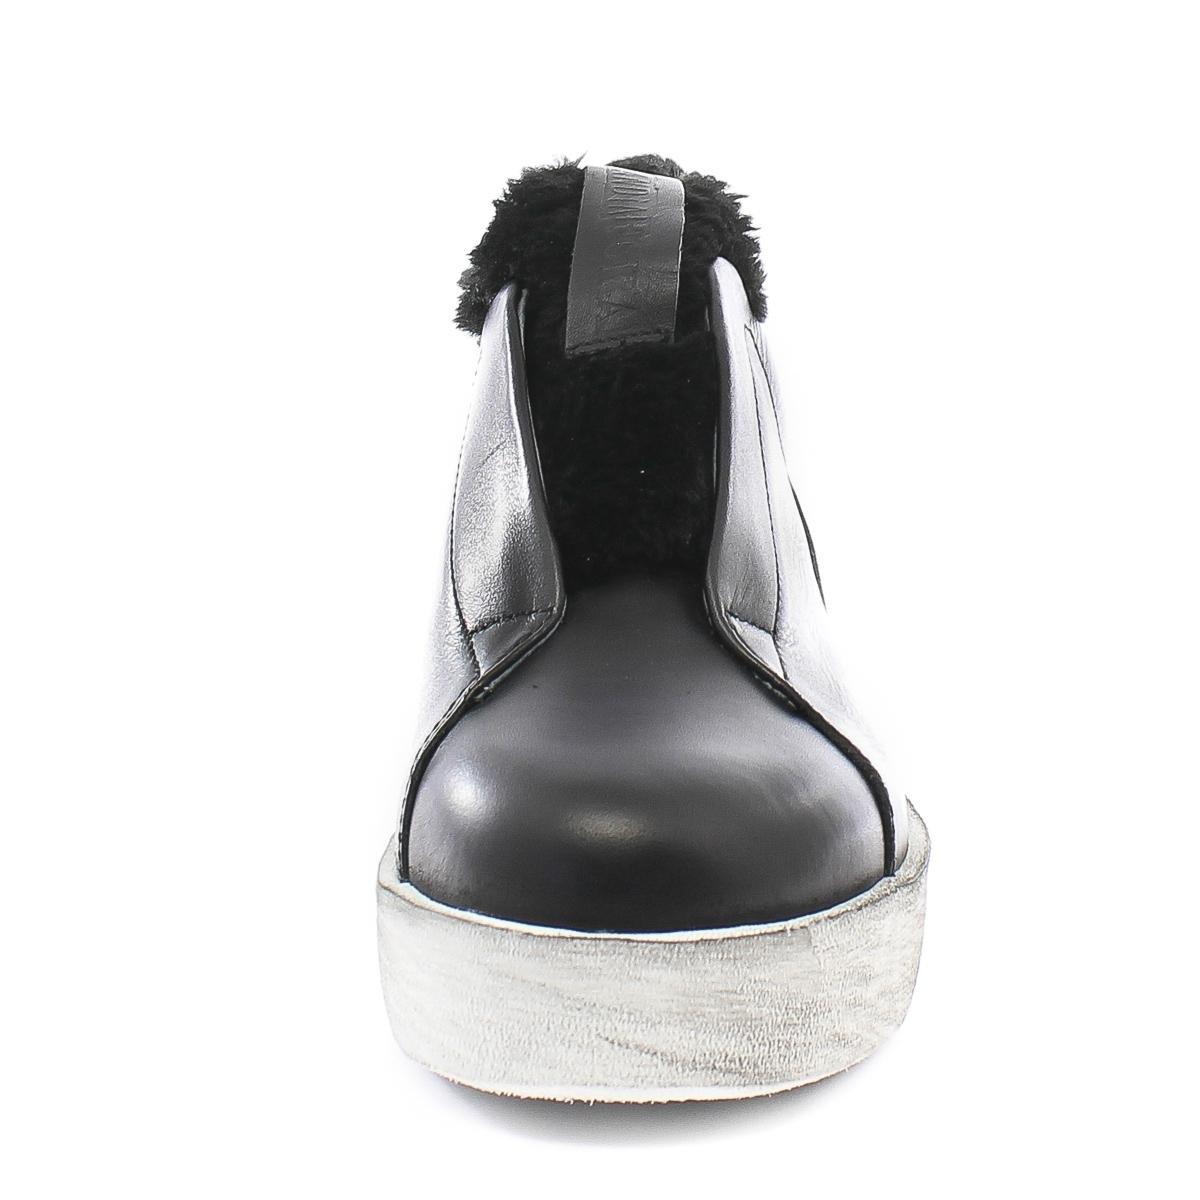 Andia Fora Turnschuhe Libi Pelliccia Roxy Bianco Aviator schwarz schwarz schwarz a67511